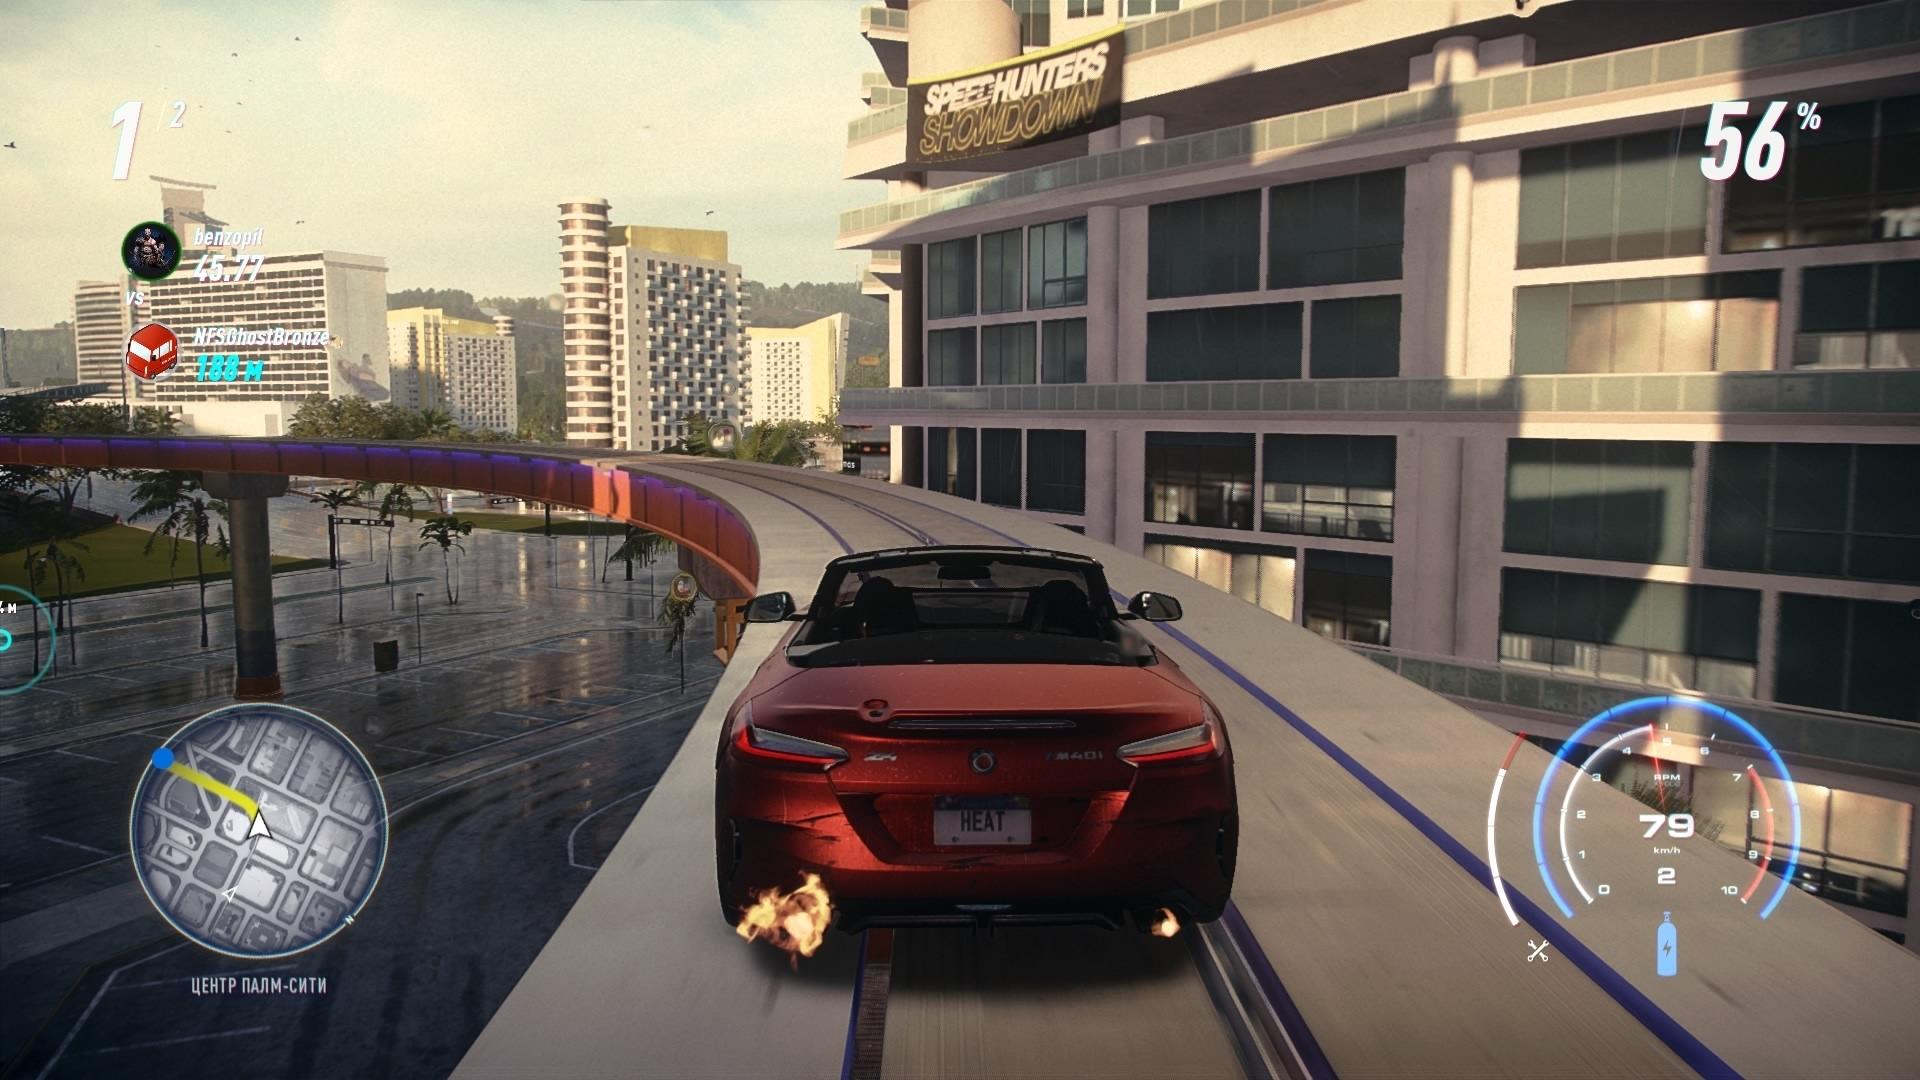 На Need for Speed: Heat для Xbox One появилась скидка в 35 % спустя 12 дней после релиза